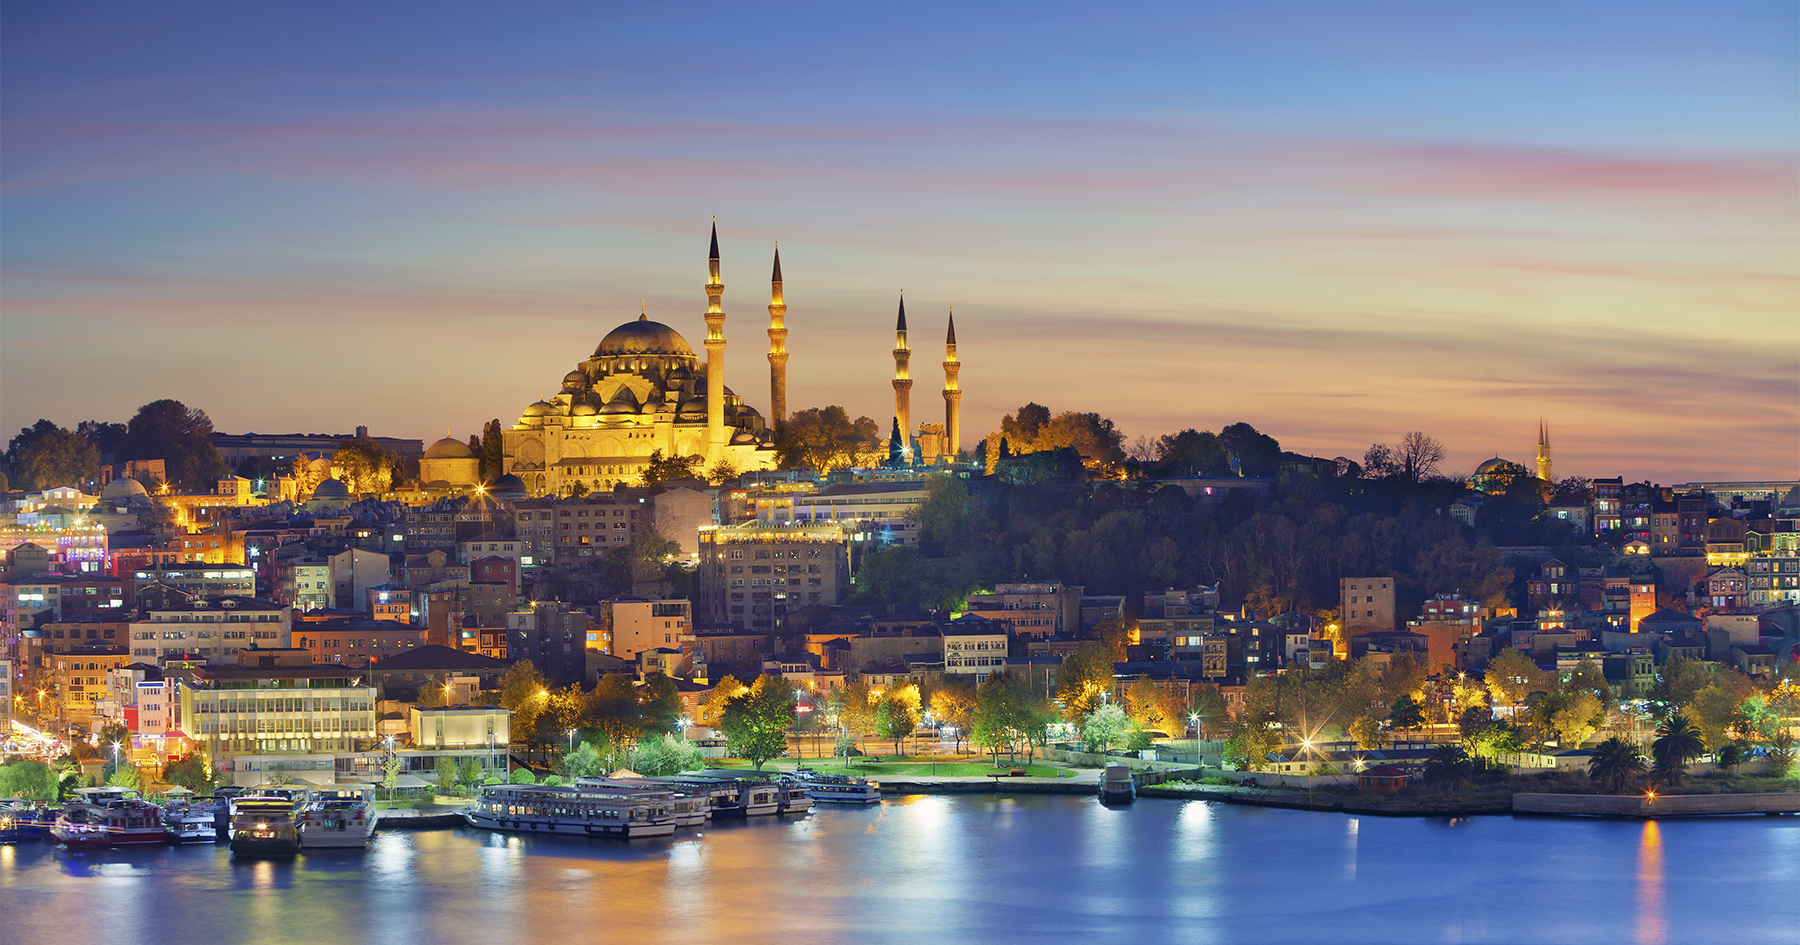 Foreign buyers in Turkey, a 10 billion dollar market - FBW